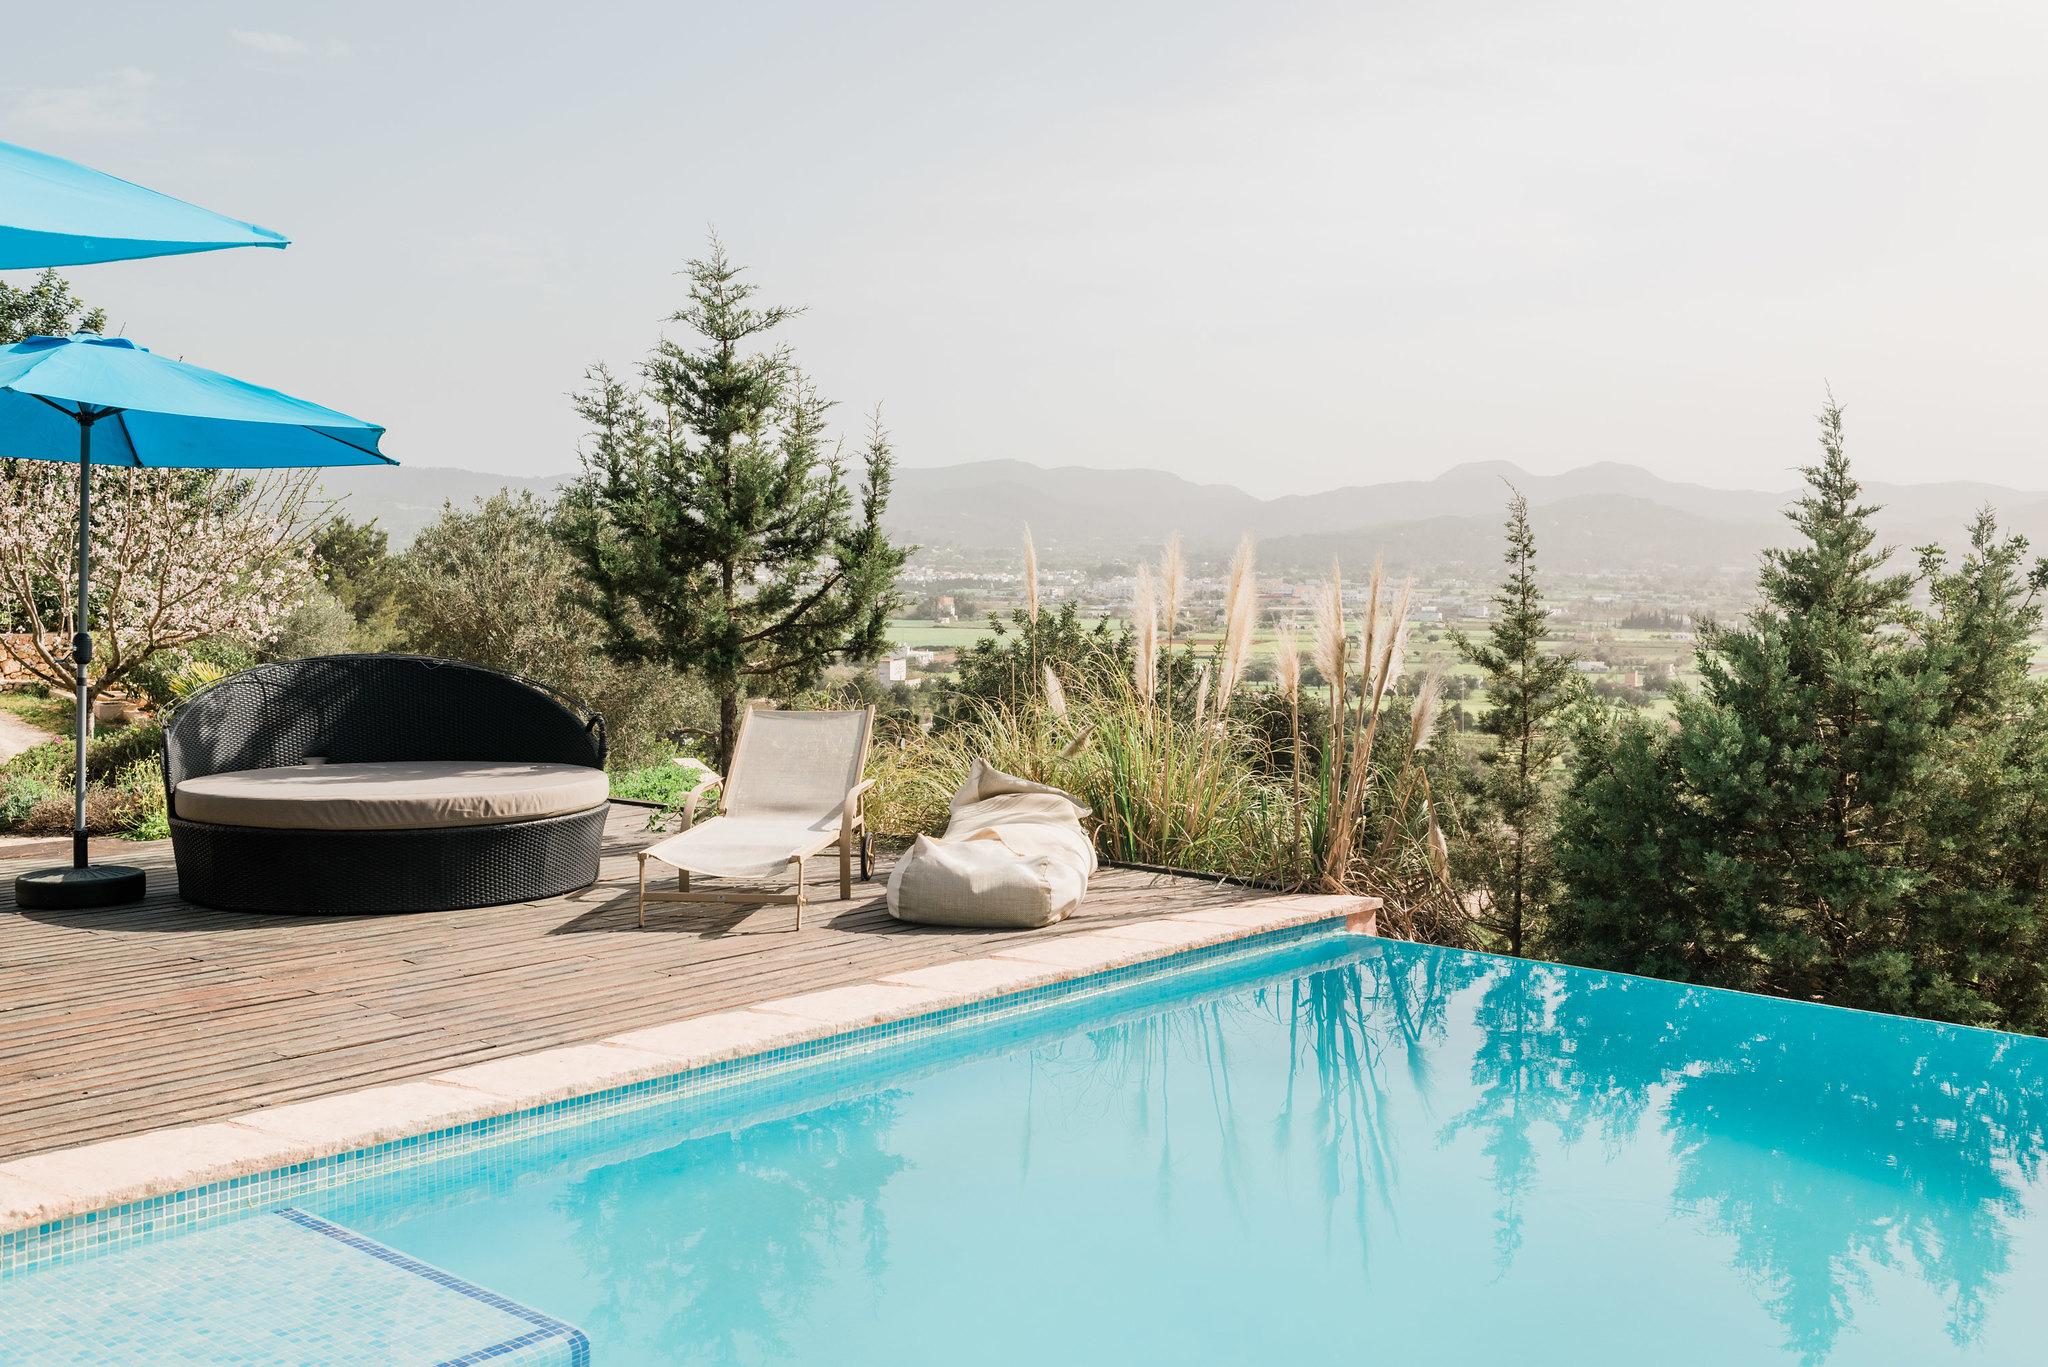 https://www.white-ibiza.com/wp-content/uploads/2020/06/white-ibiza-villas-los-corrales-exterior-corner-of-pool.jpg